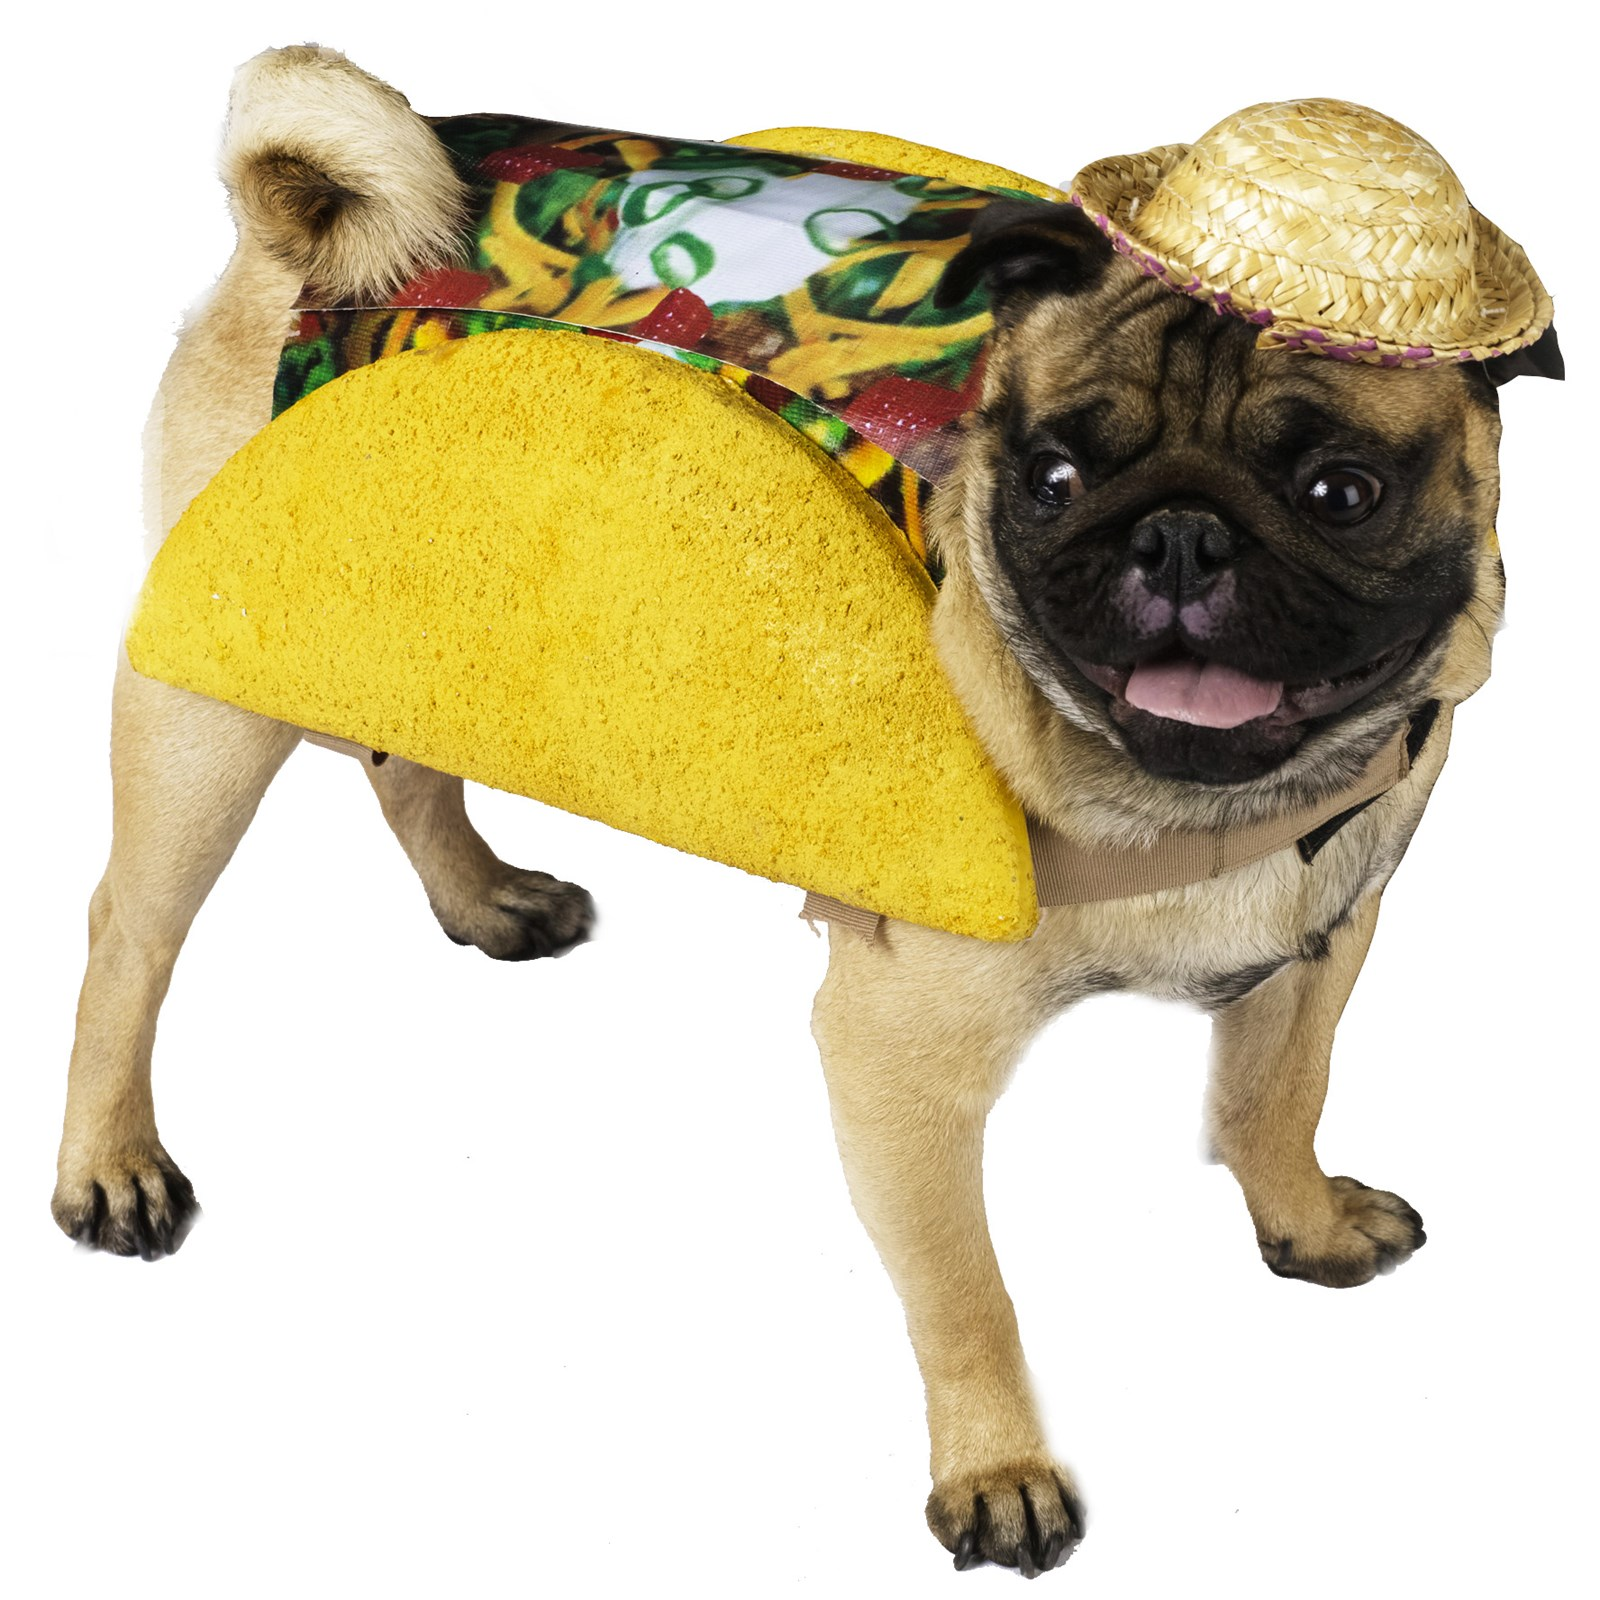 dog-taco-costume-bc-61490.jpg?zm=1600,1600,1,0,0